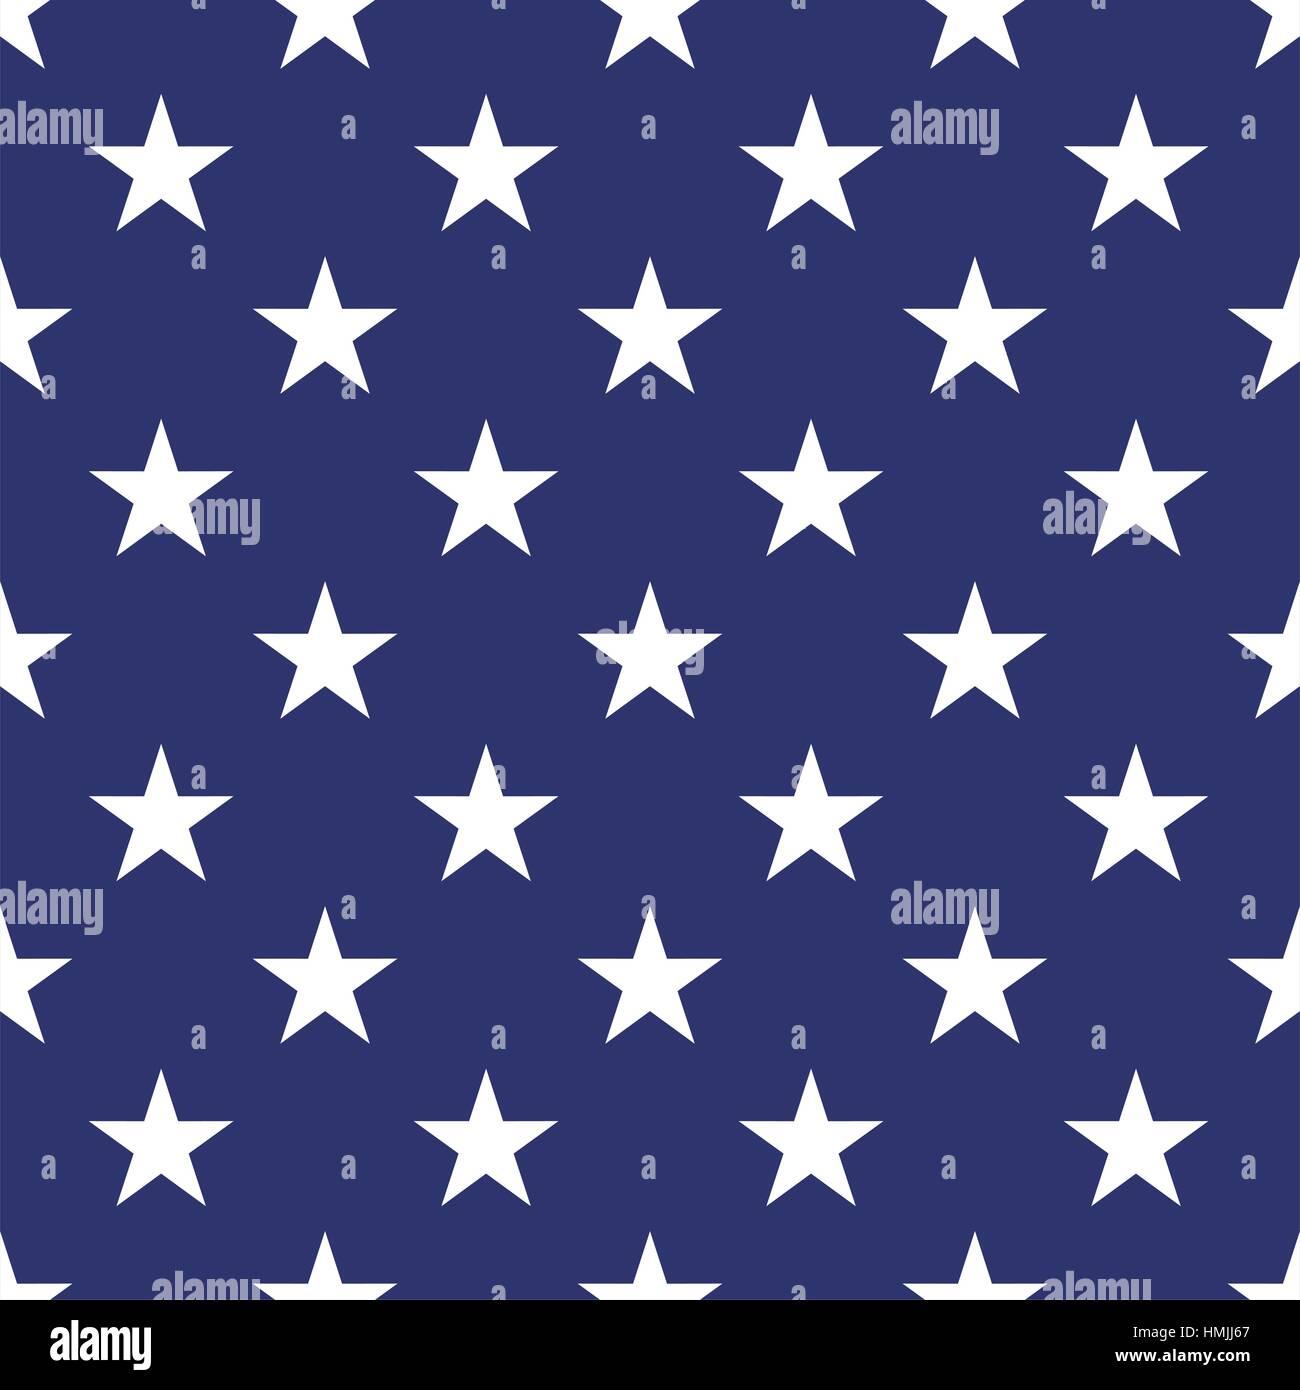 Patriotic usa seamless pattern american flag symbols and colors patriotic usa seamless pattern american flag symbols and colors background for 4th july usa buycottarizona Choice Image